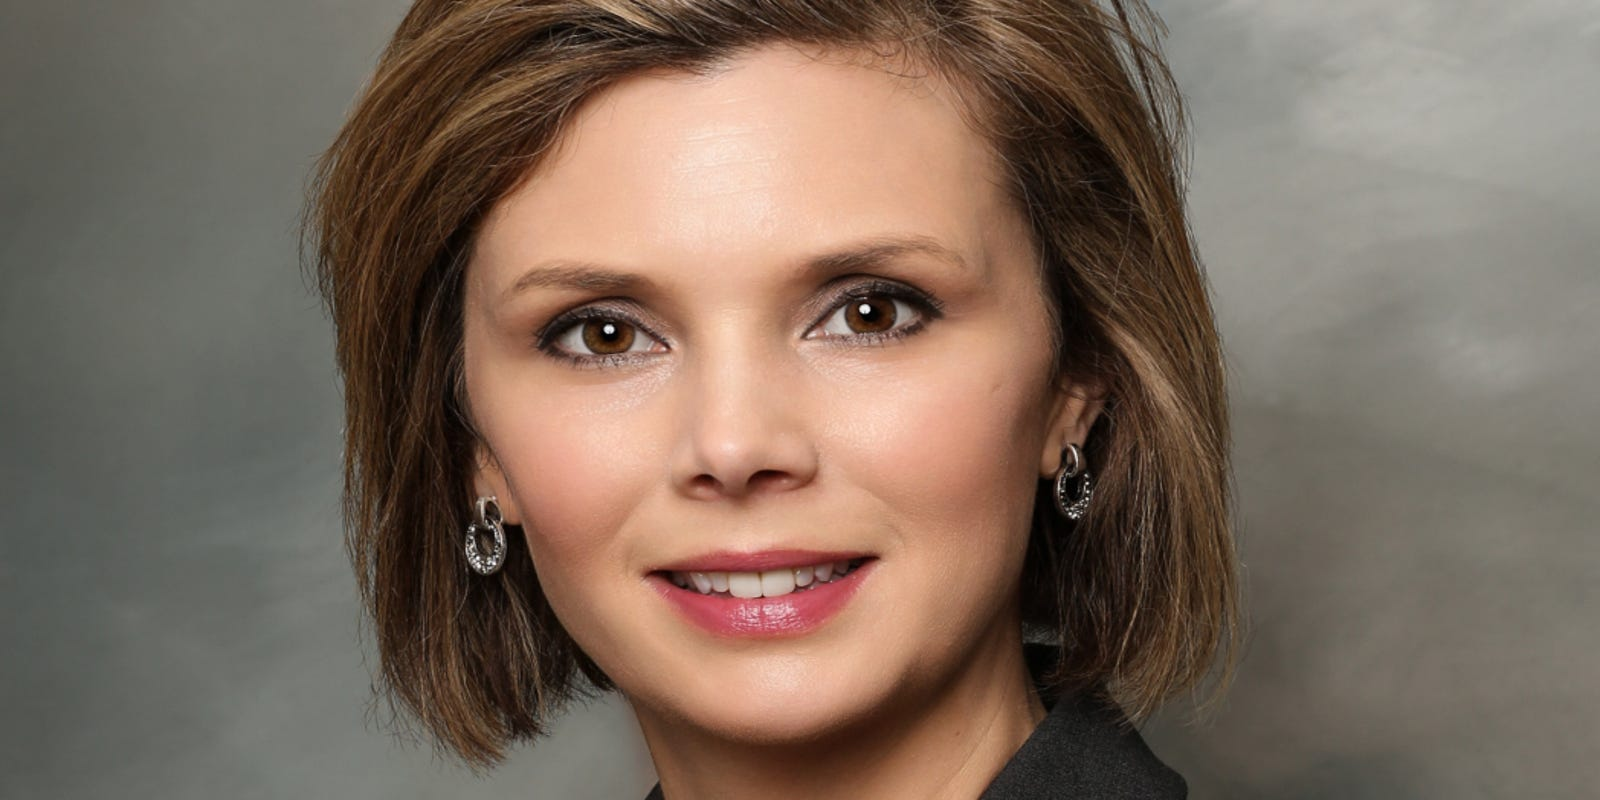 Iowa public health spokesperson Amy McCoy resigns to take private sector job